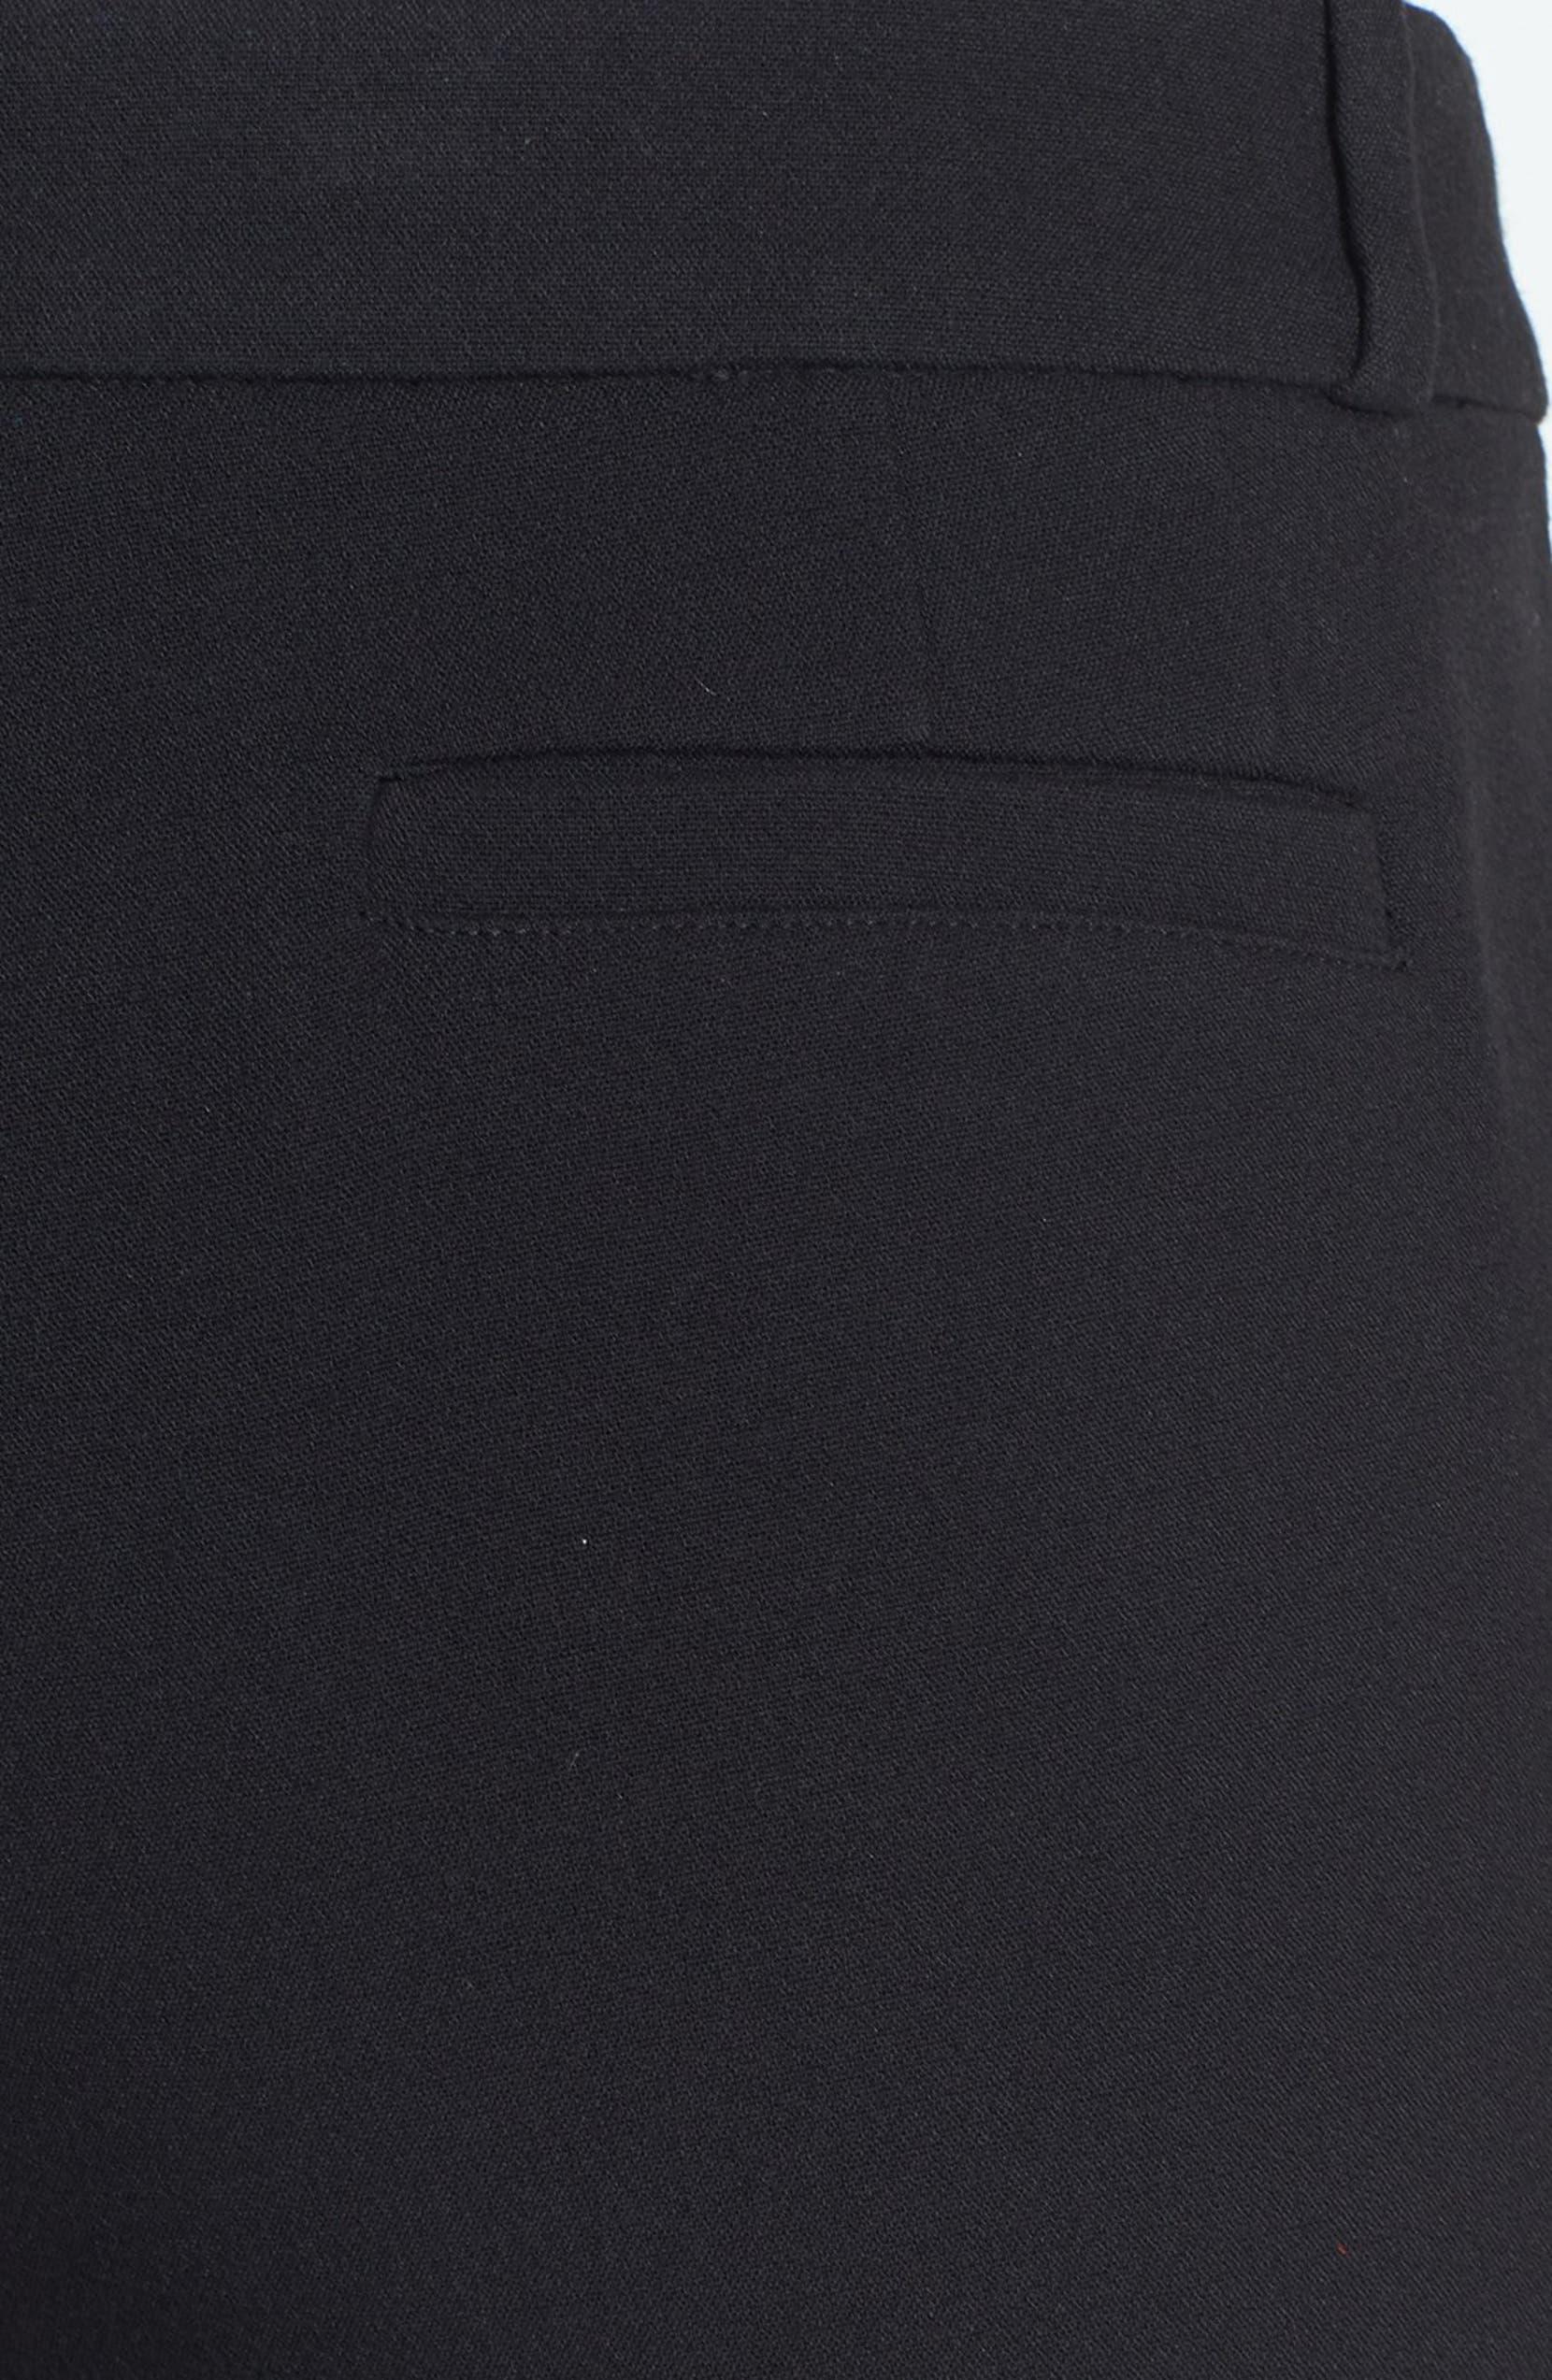 f0eeba6726 kate spade new york 'jackie' scalloped hem capri pants | Nordstrom